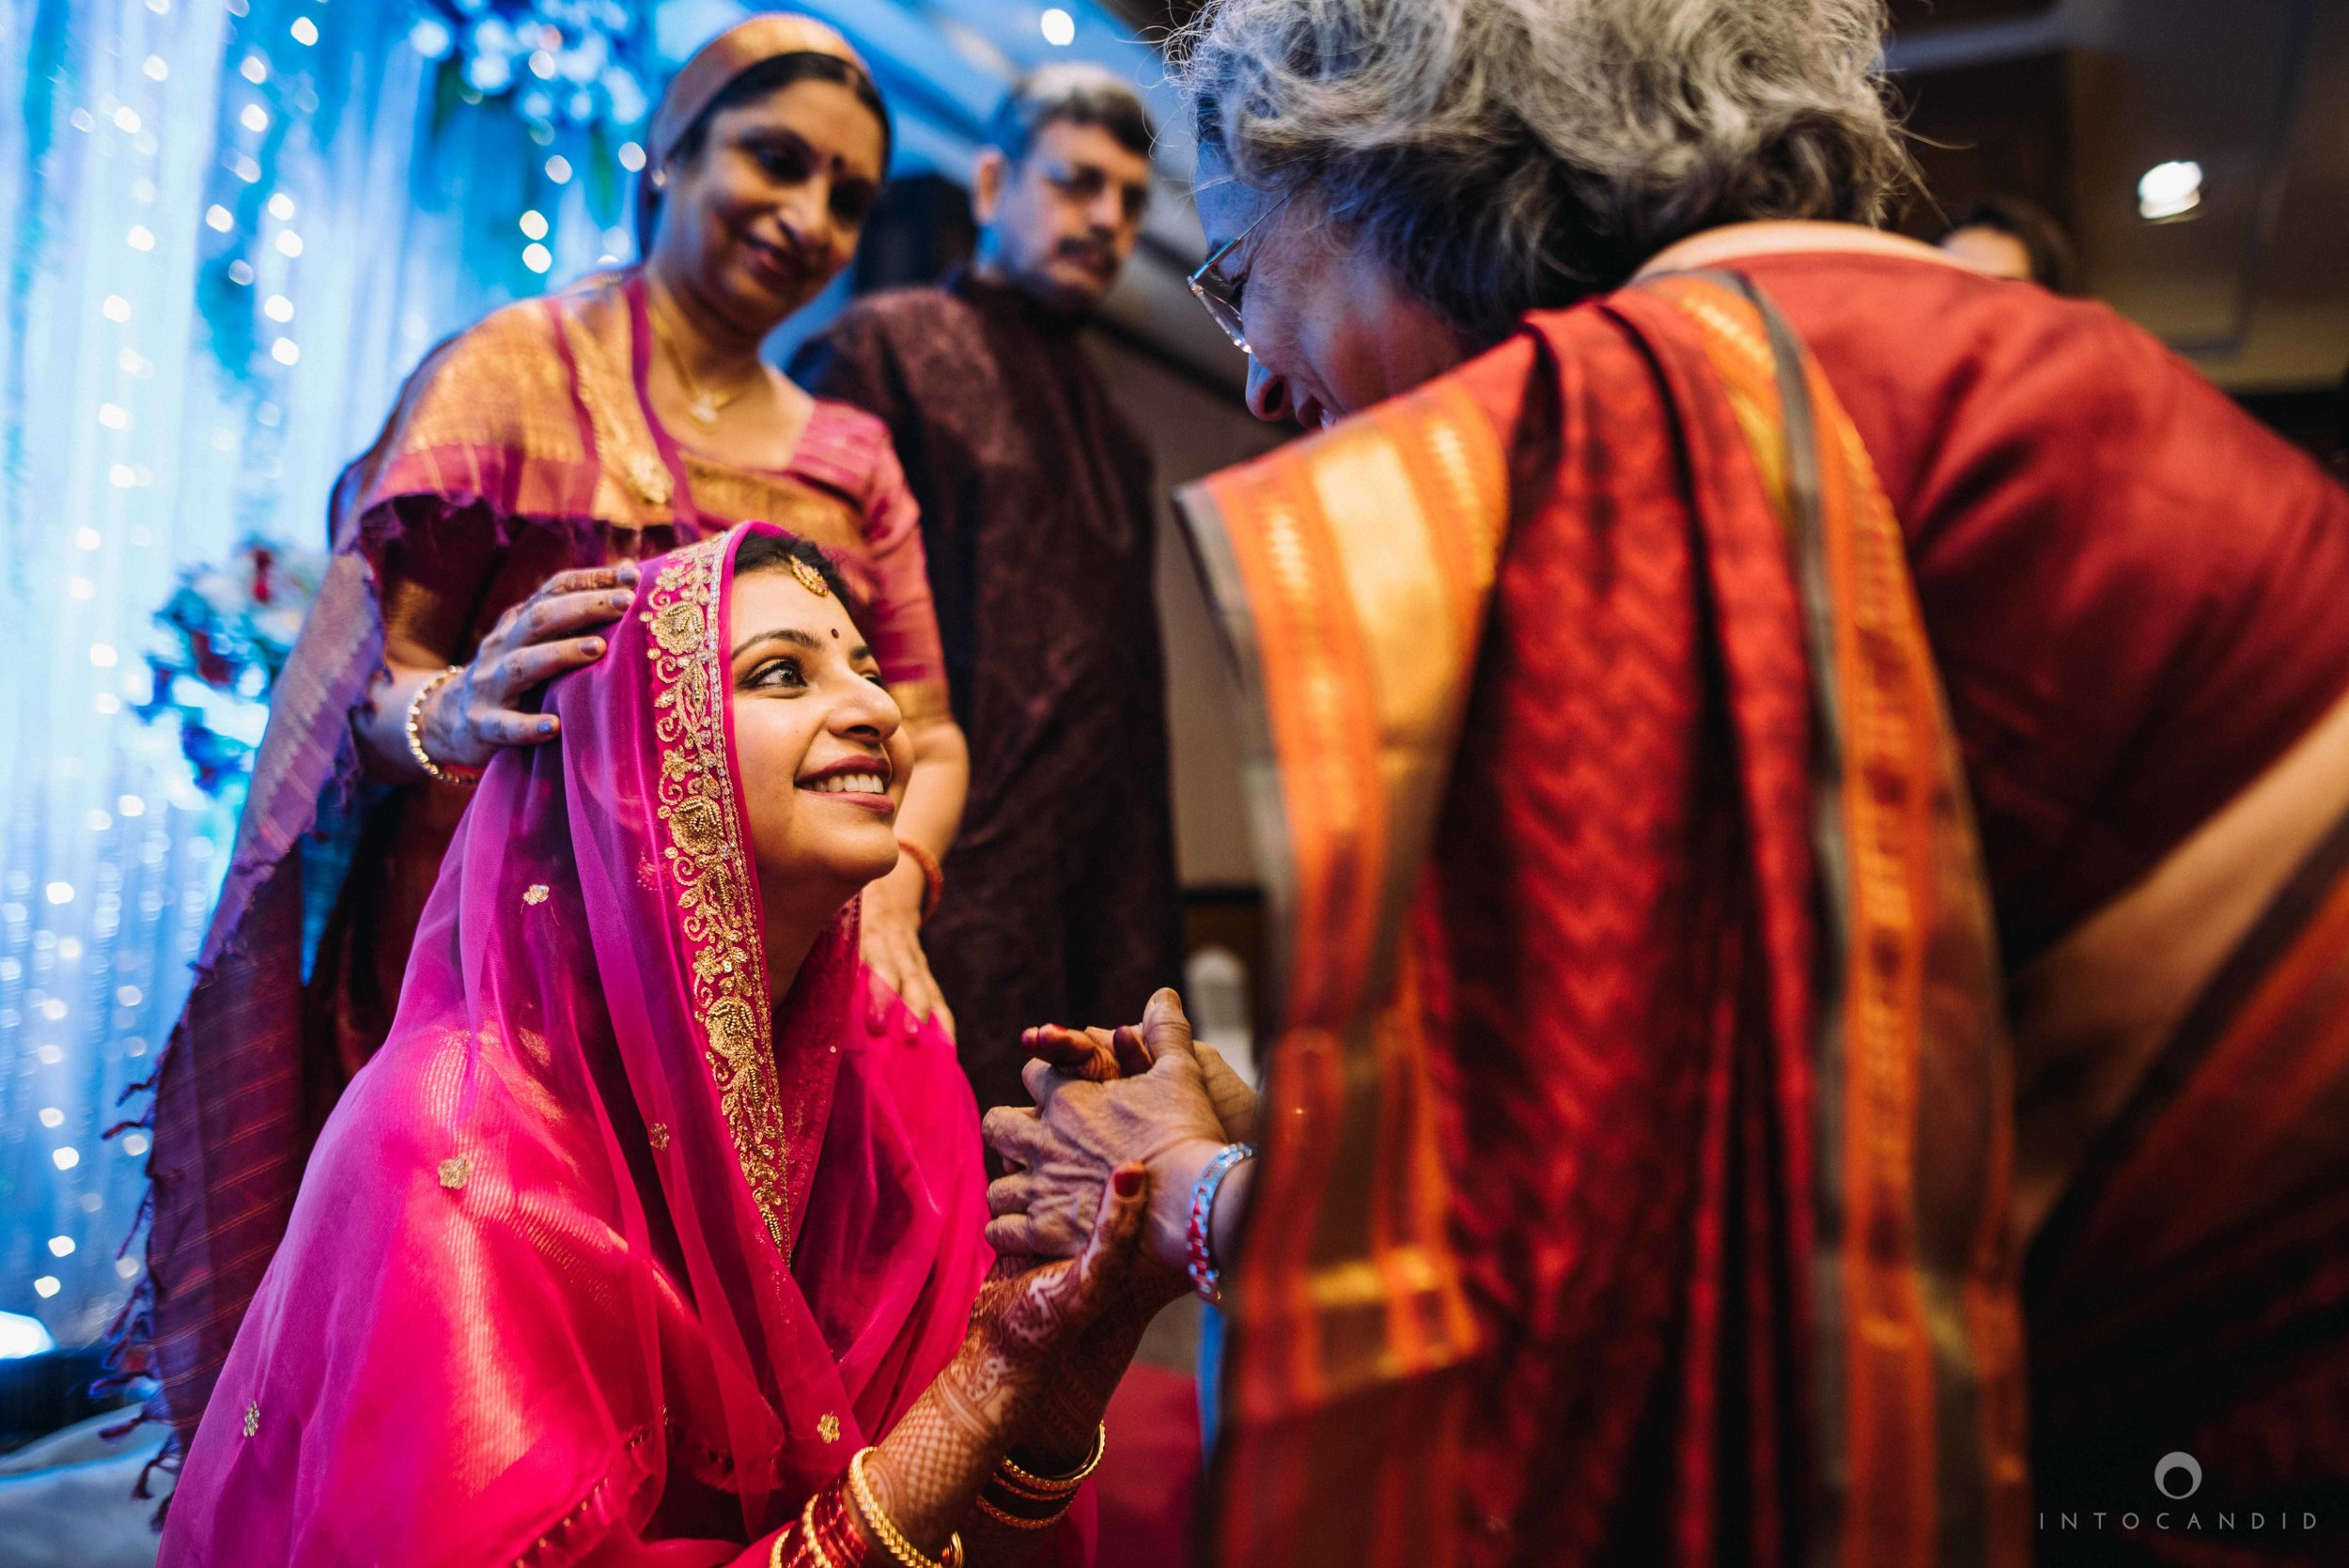 Bangalore_Wedding_Photographer_Indian_Wedding_Photography_27.jpg